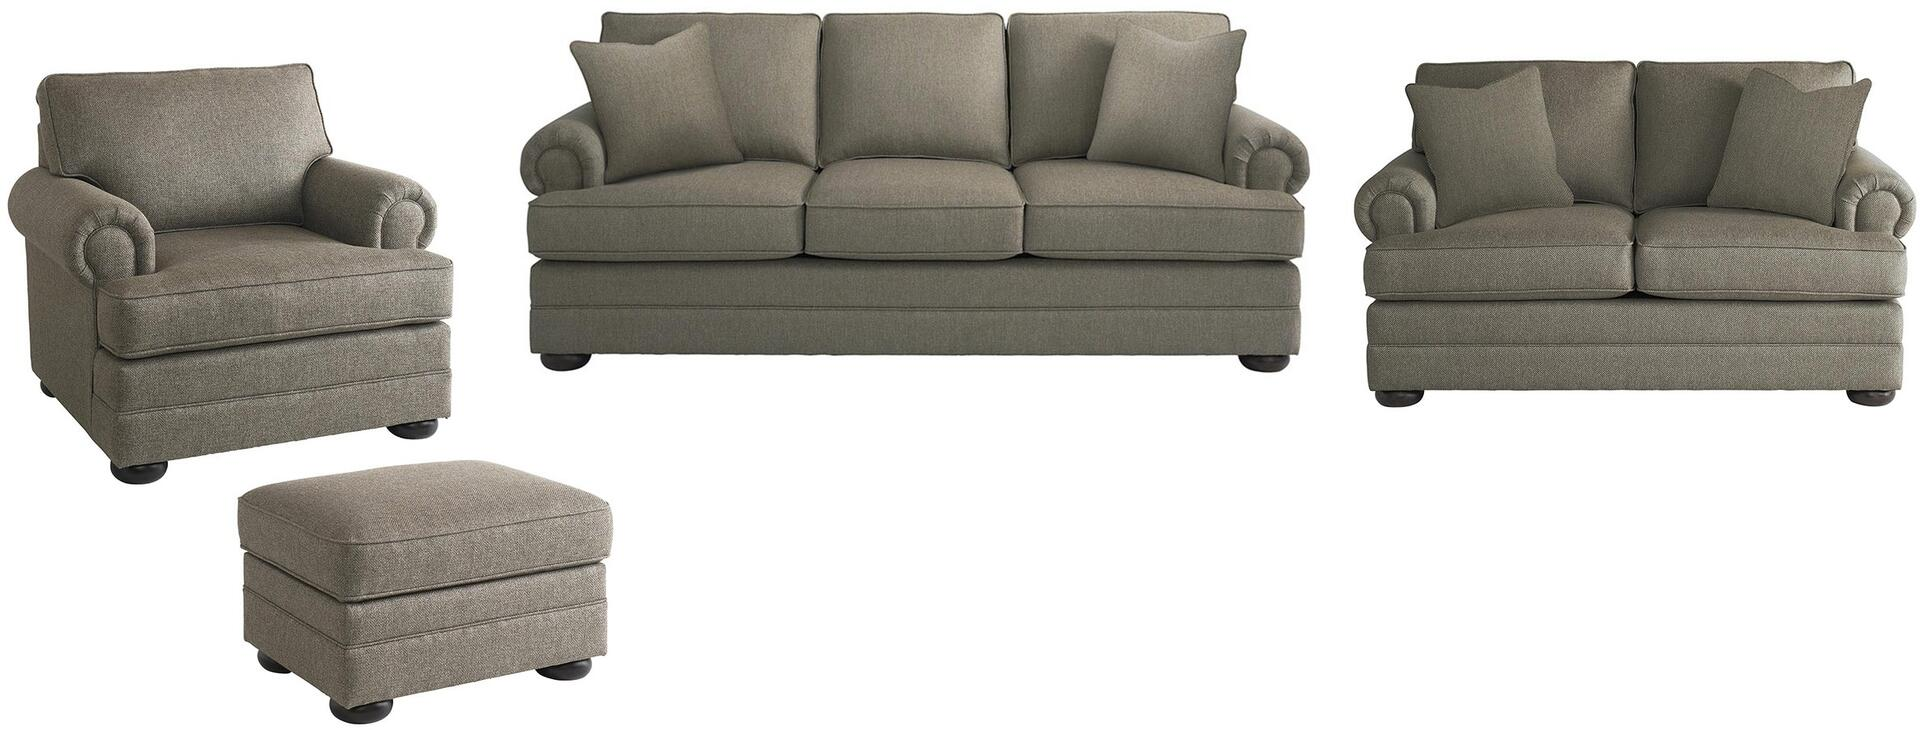 Bassett Furniture 3913fcfc1618slco Hyde Park Living Room Set Appliances Connection